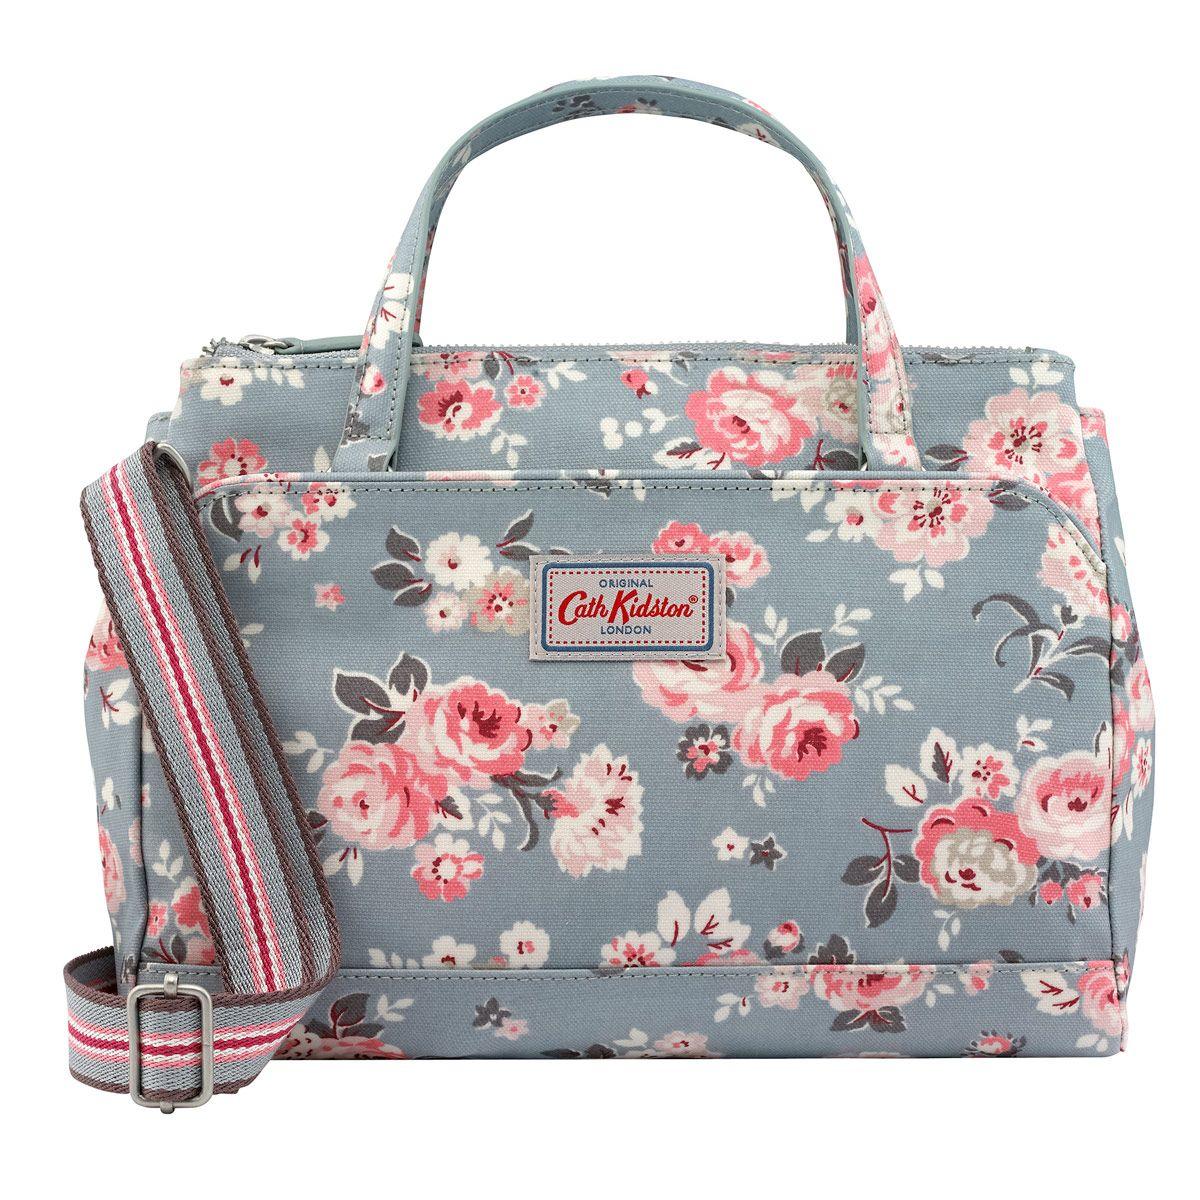 319dcfb9b49d Wells Rose Mini Multi Pocket Handbag   Handbags   CathKidston ...